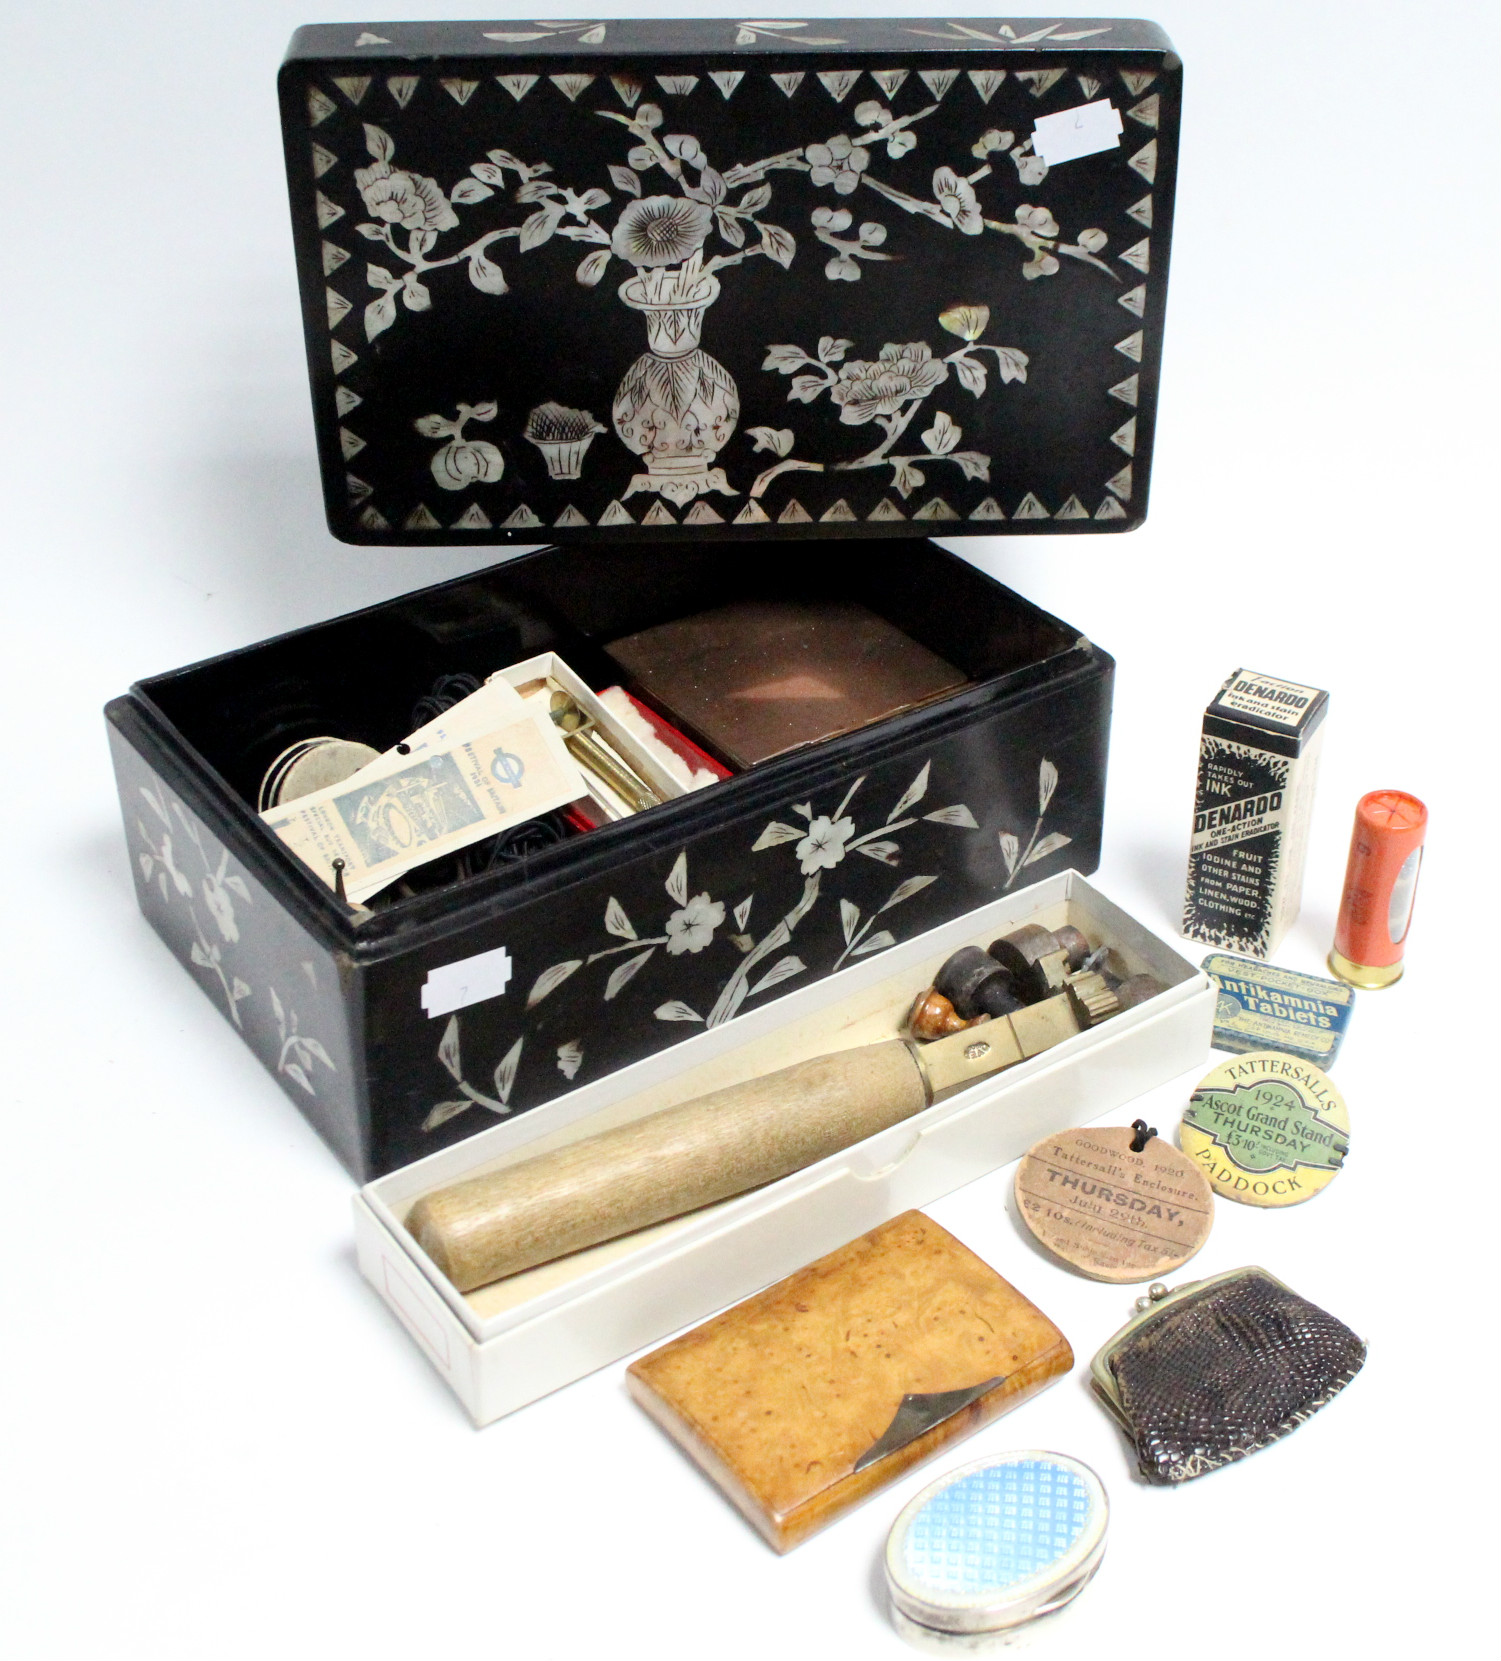 Lot 198 - *PLEASE NOTE AMMENDED DESCRIPTION/IMAGES* A George V burr-walnut cigarette case with silver mount,